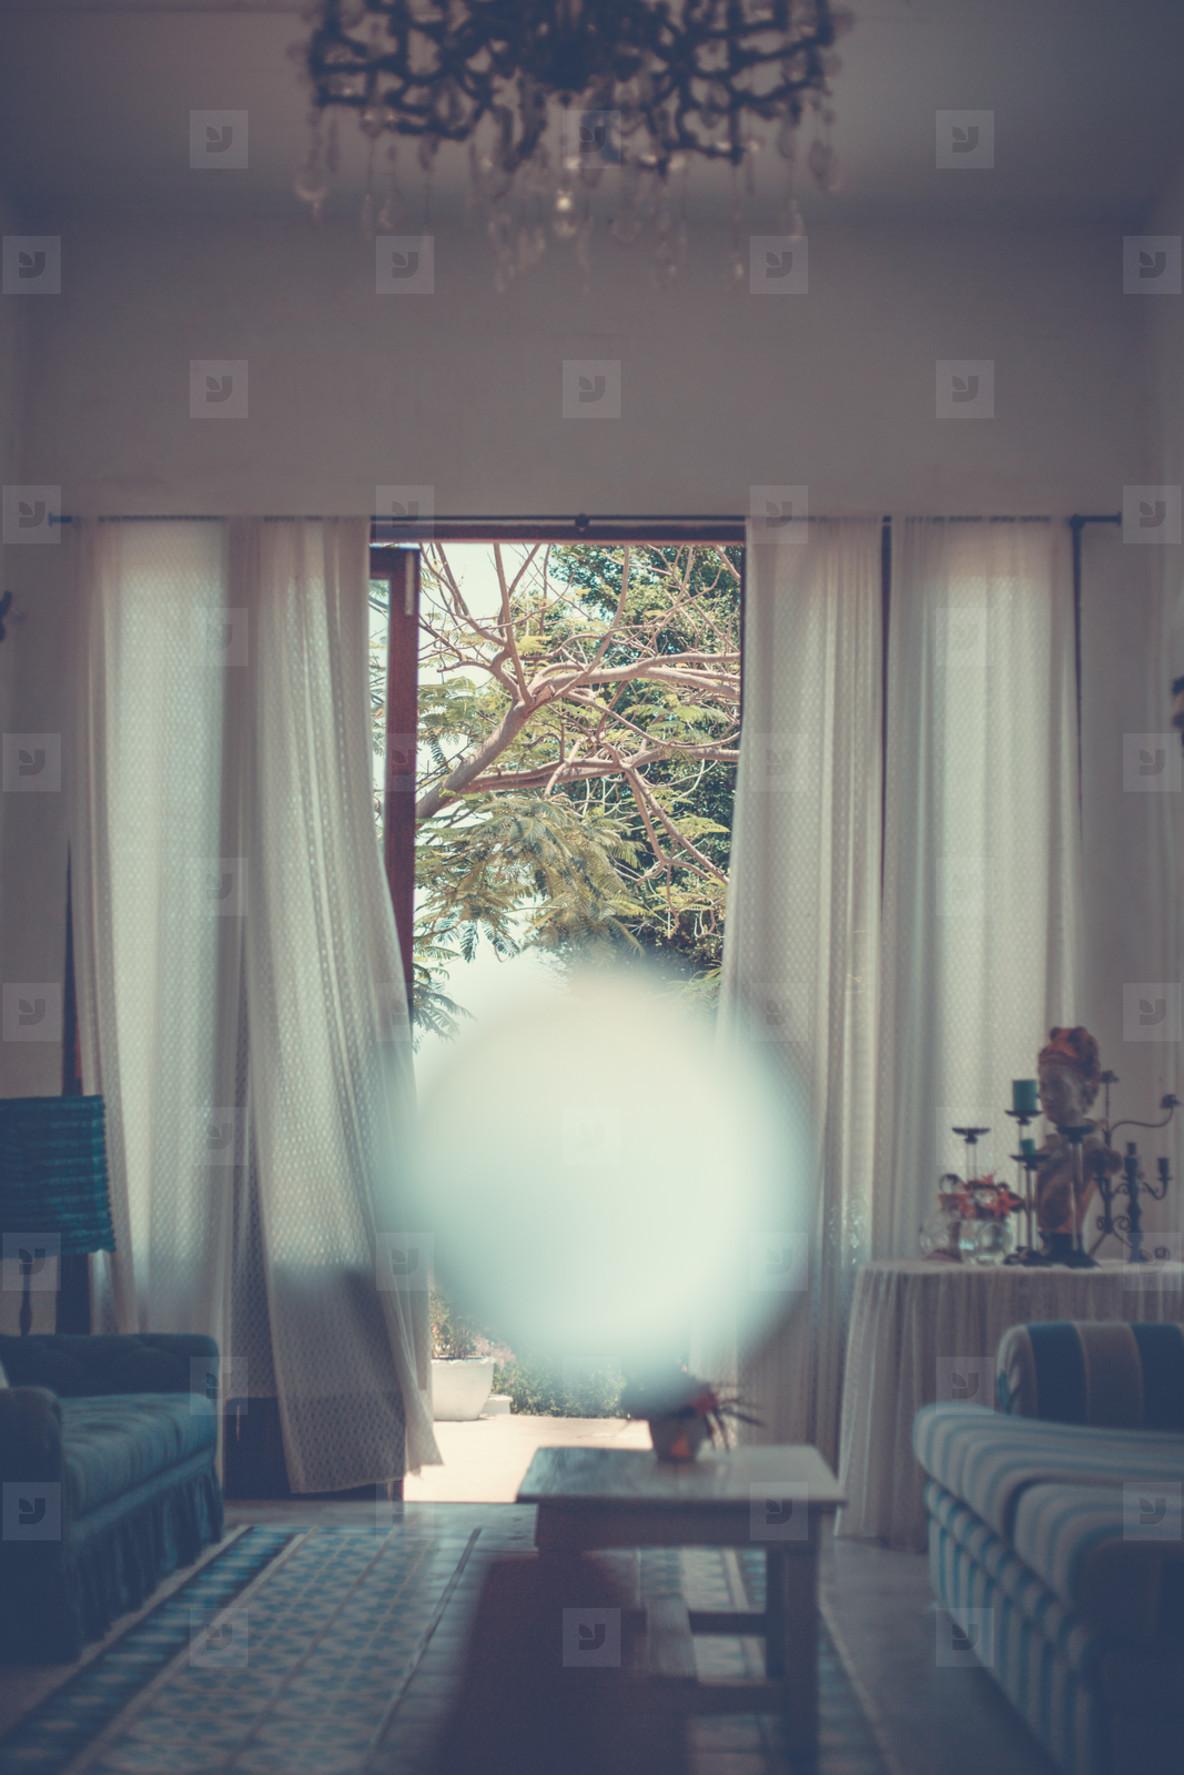 Ghostly Sphere